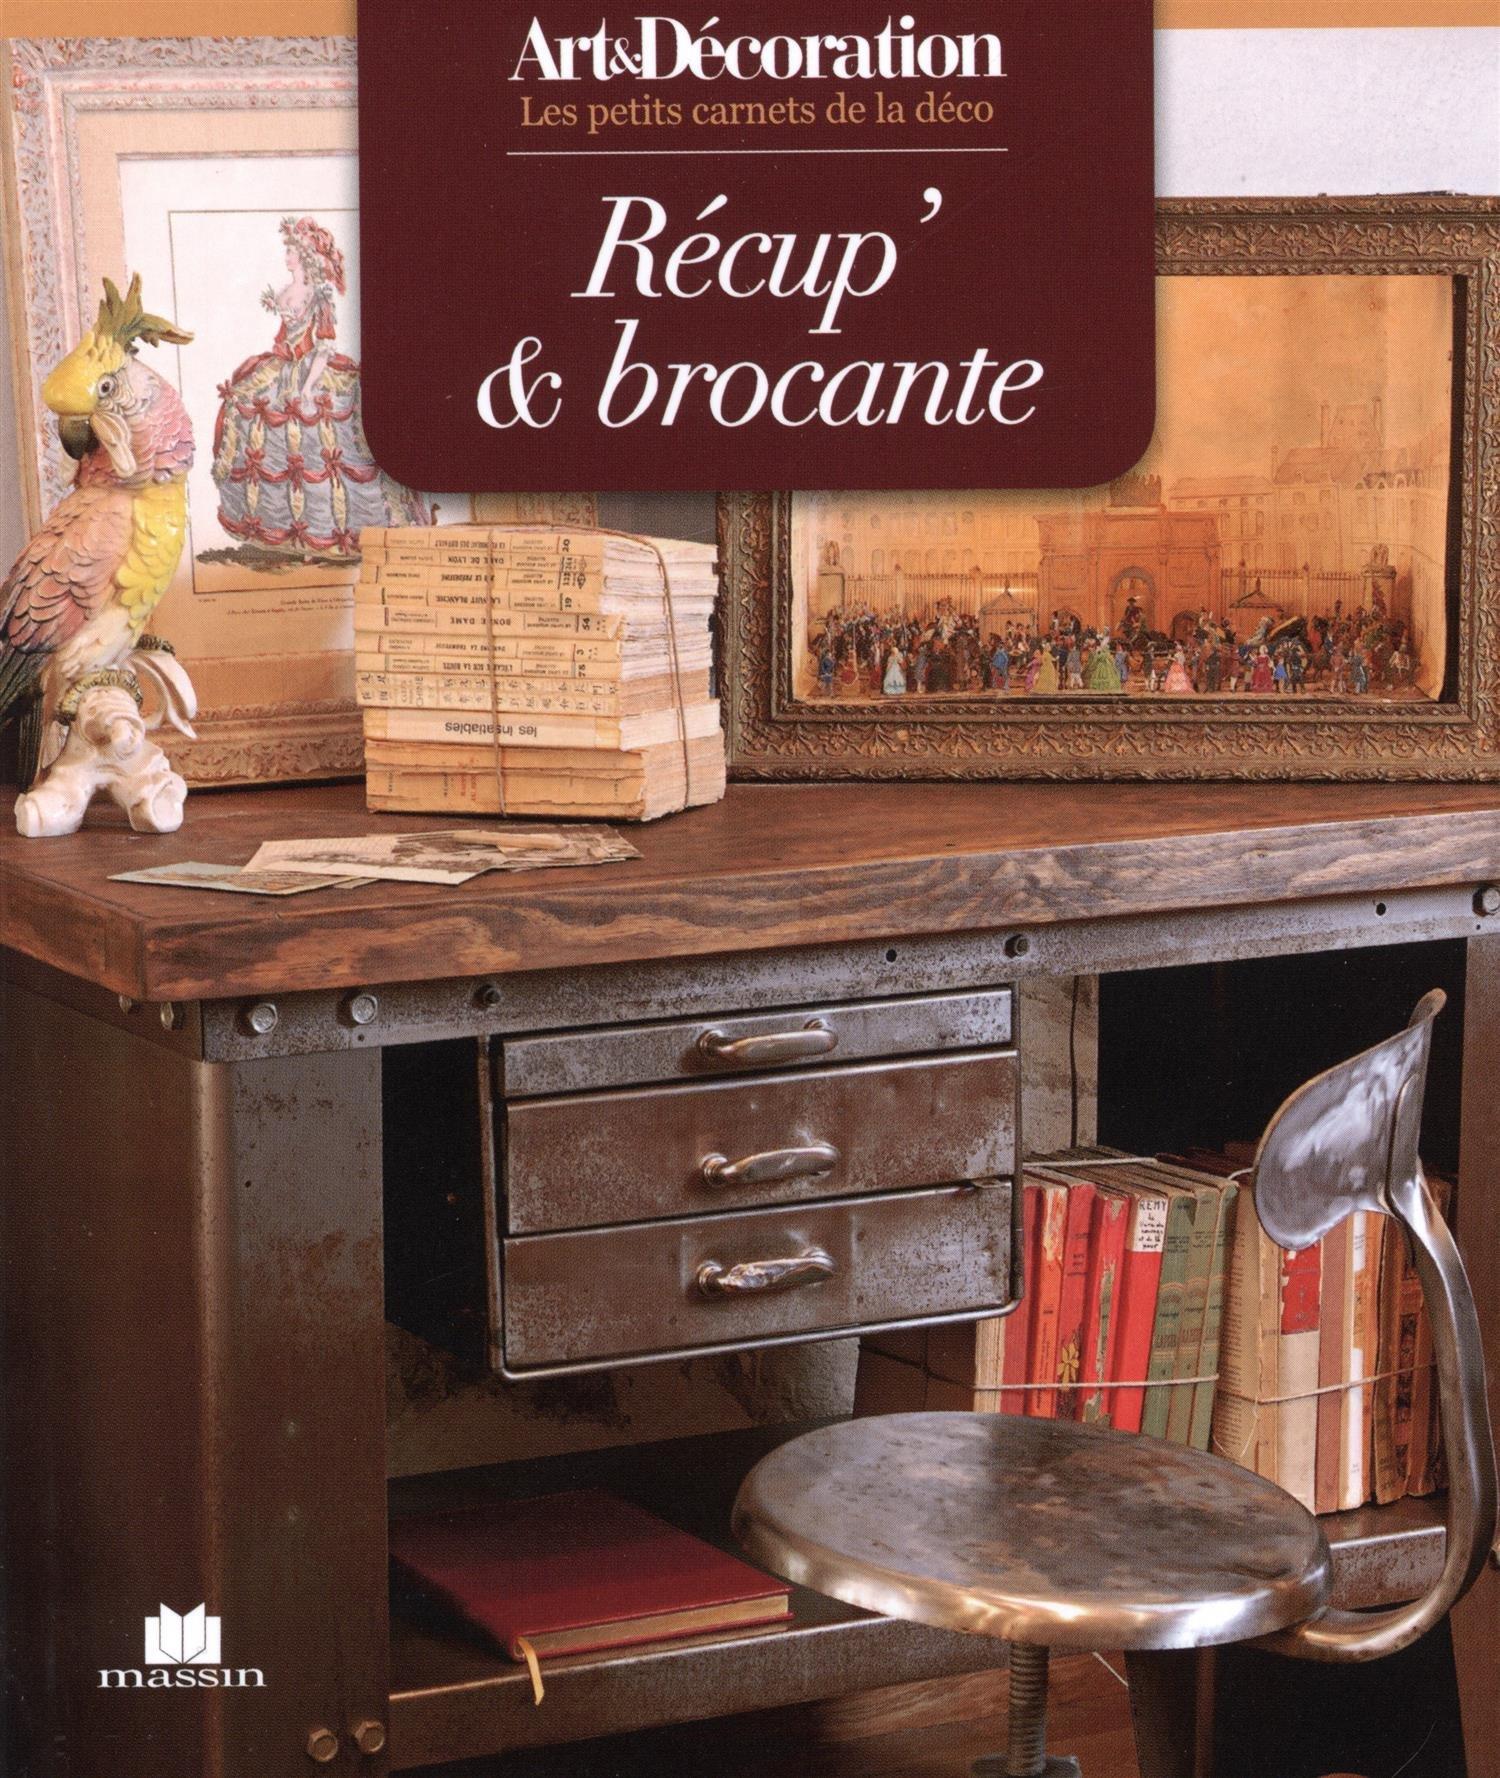 Récup' & brocante Poche – 13 janvier 2015 Karine Villame Récup' & brocante Charles Massin 2707208914